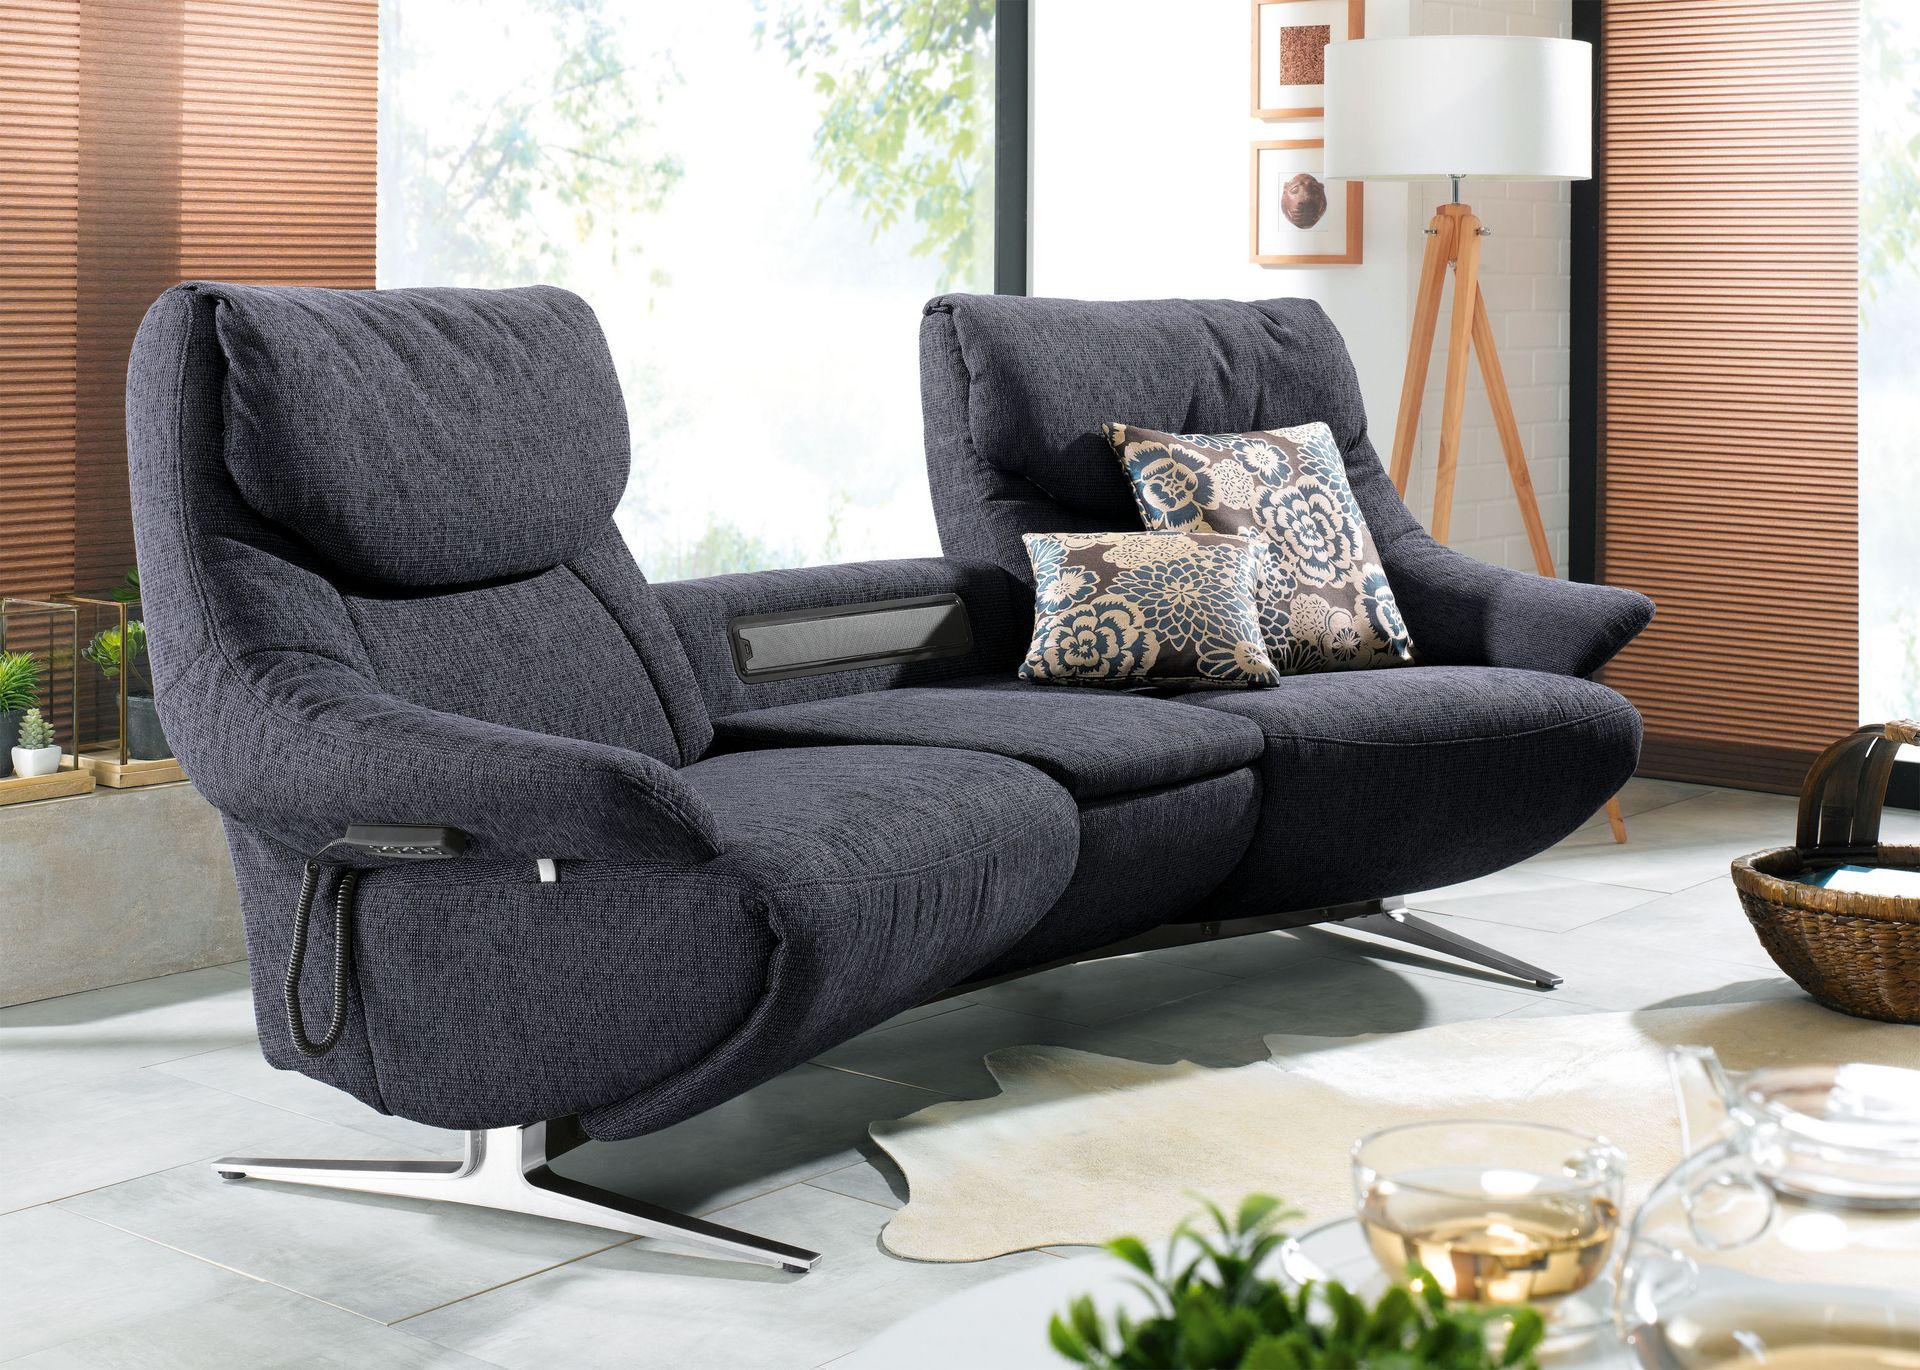 Full Size of Mondo Sofa Capocolle Bed 3 Agata Meble Brick Couch Kaufen Softline Leder Group Srl Bertinoro Erfahrungen 1 2 Orari Alcantara Xxl U Form Zweisitzer Mit Boxen Sofa Mondo Sofa